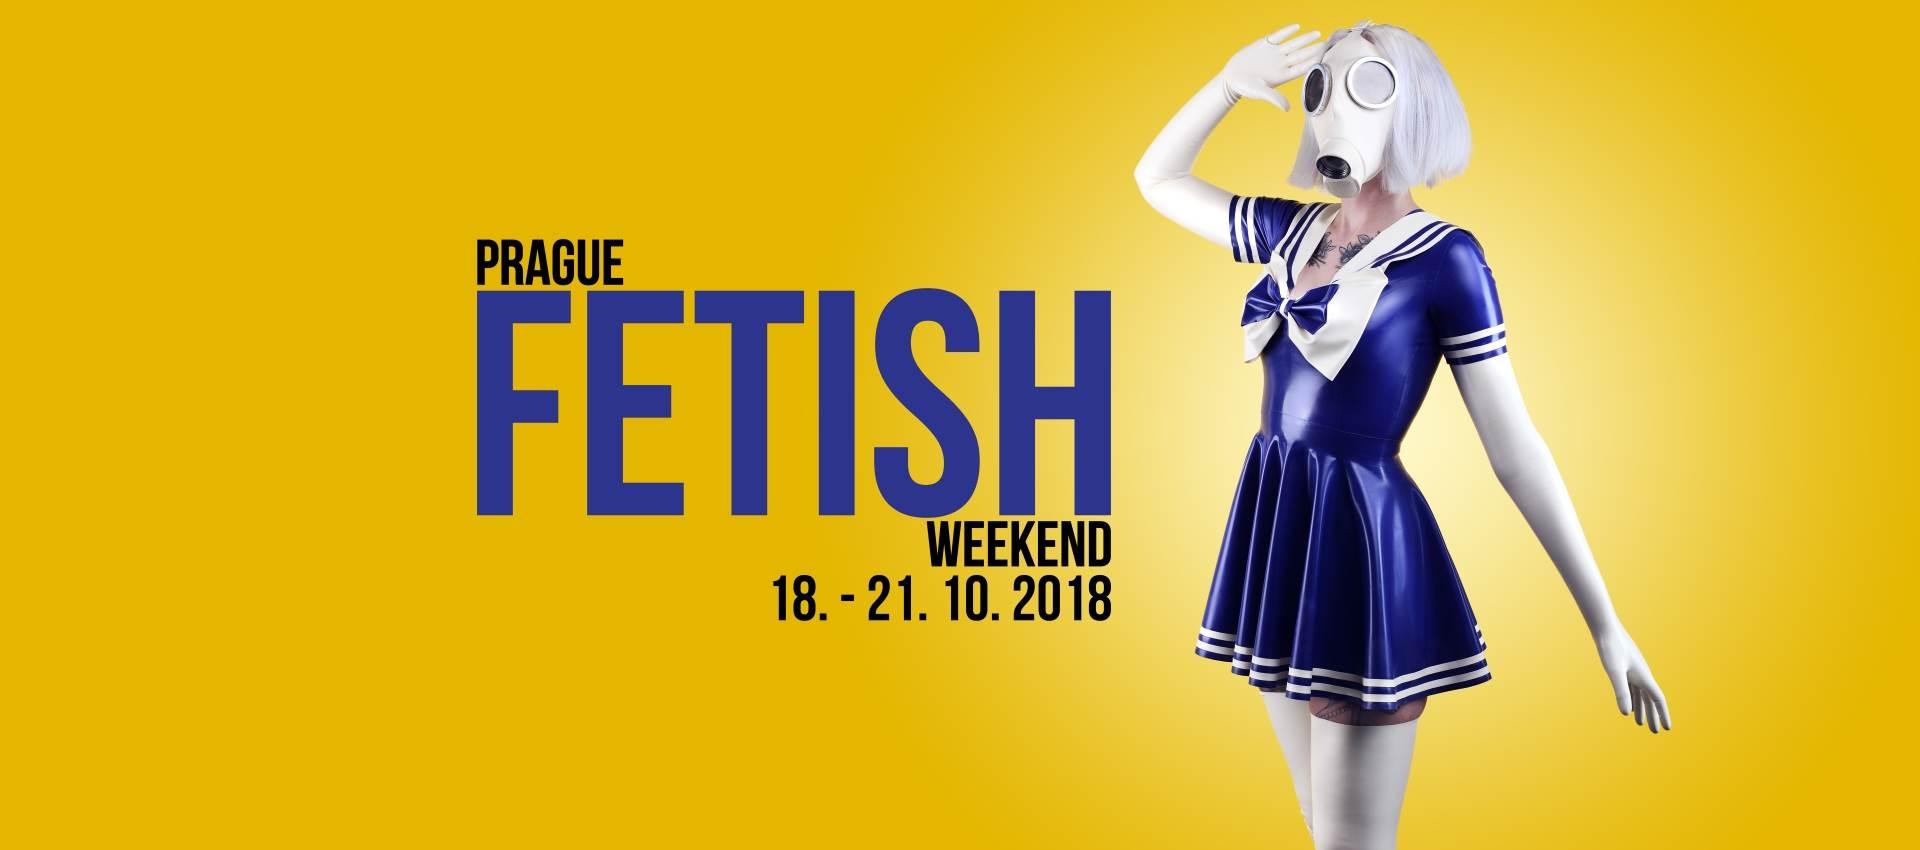 Co bude nového na Prague Fetish Weekend 2018?